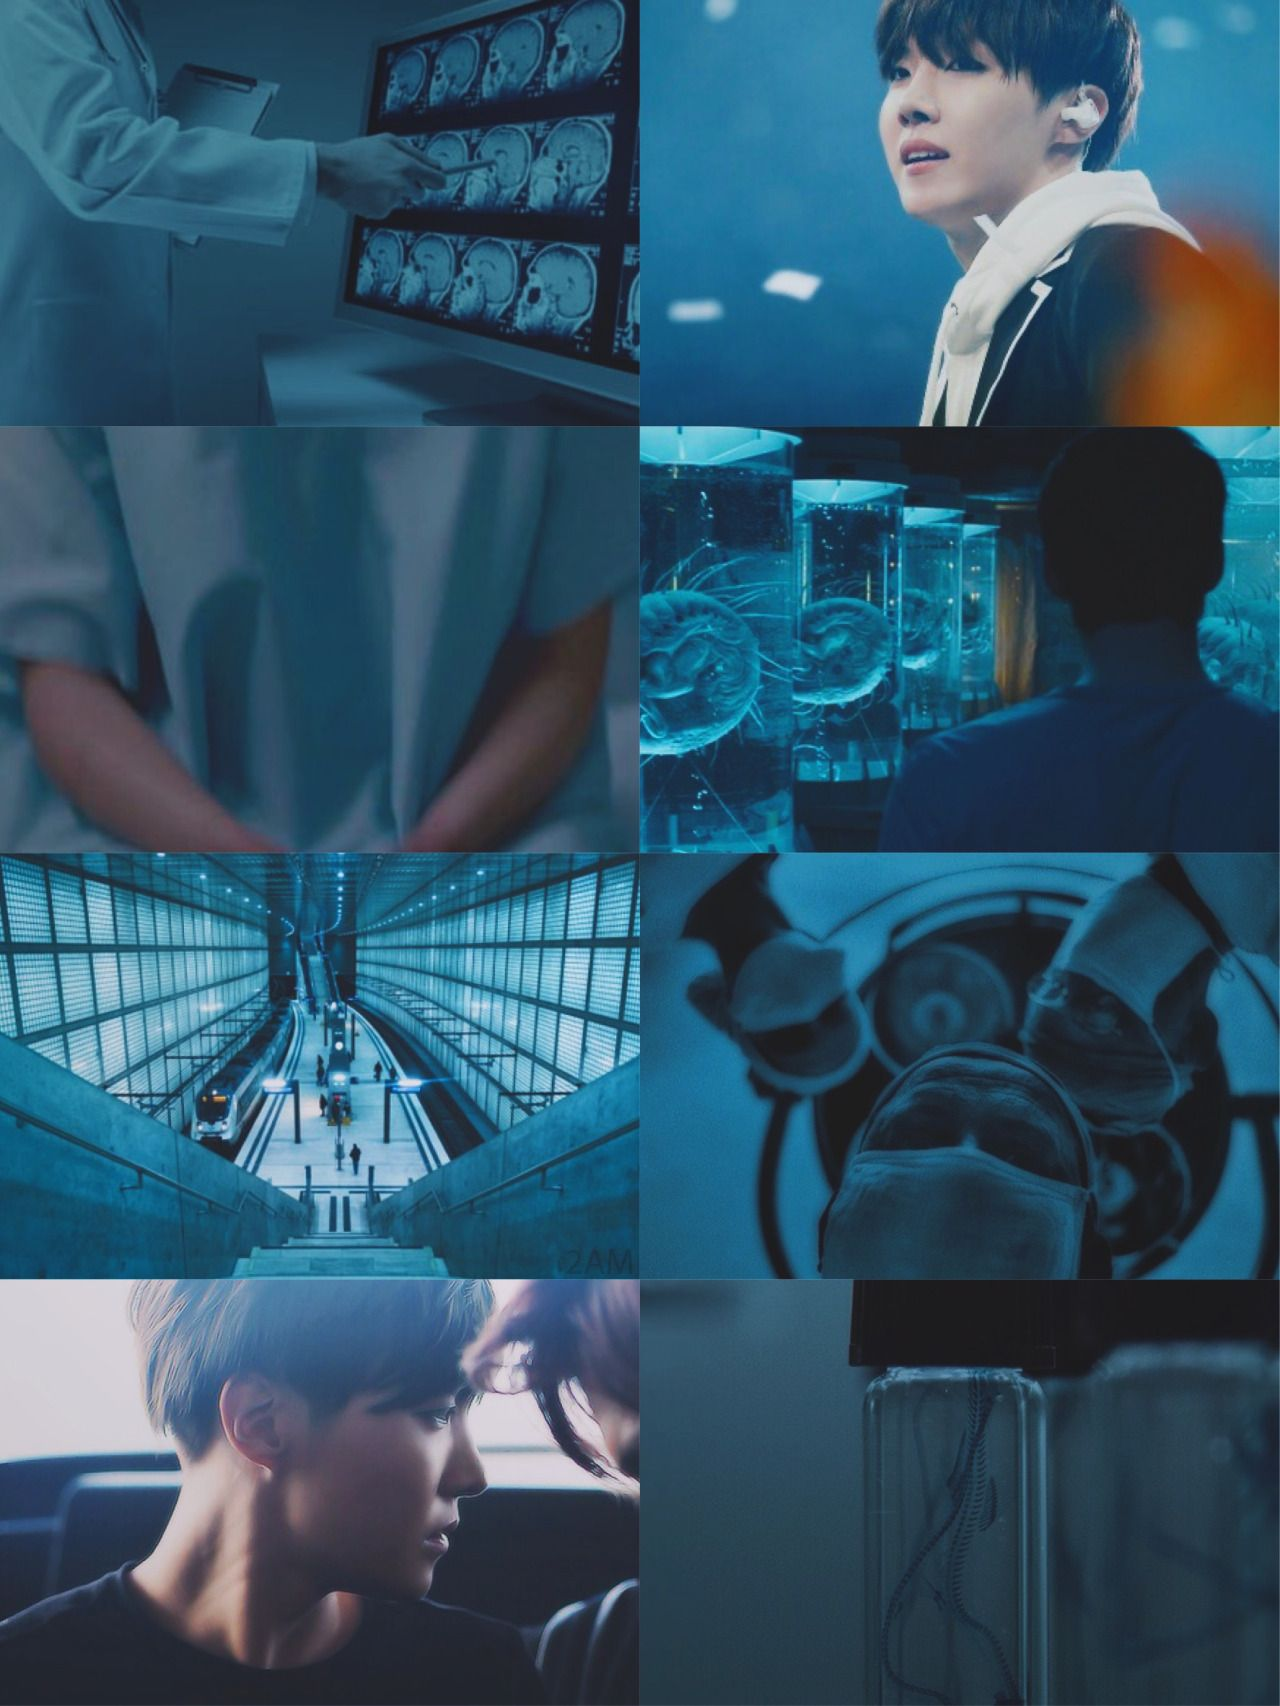 bts aesthetic Tumblr tumblr. Pinterest BTS, Kpop